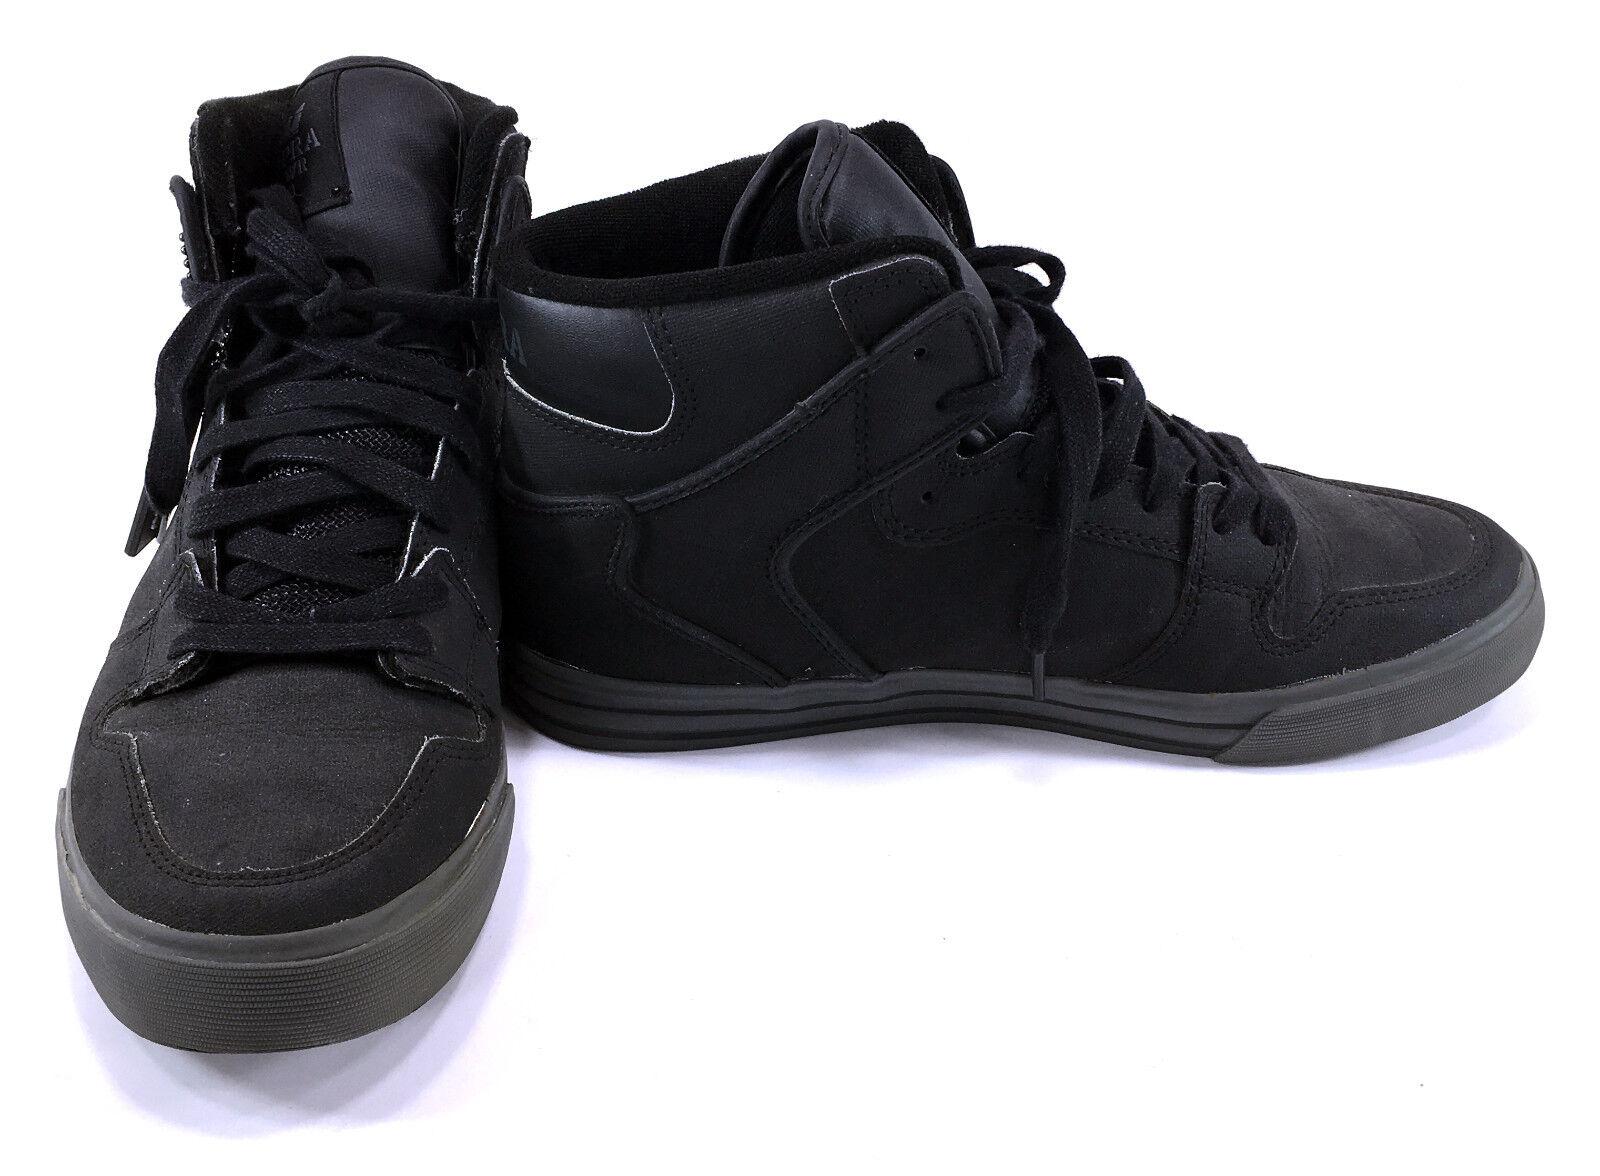 4151a995745da Supra Shoes Mid Canvas Athletic Skate Skate Skate Black Sneakers Size 8  3e96fc